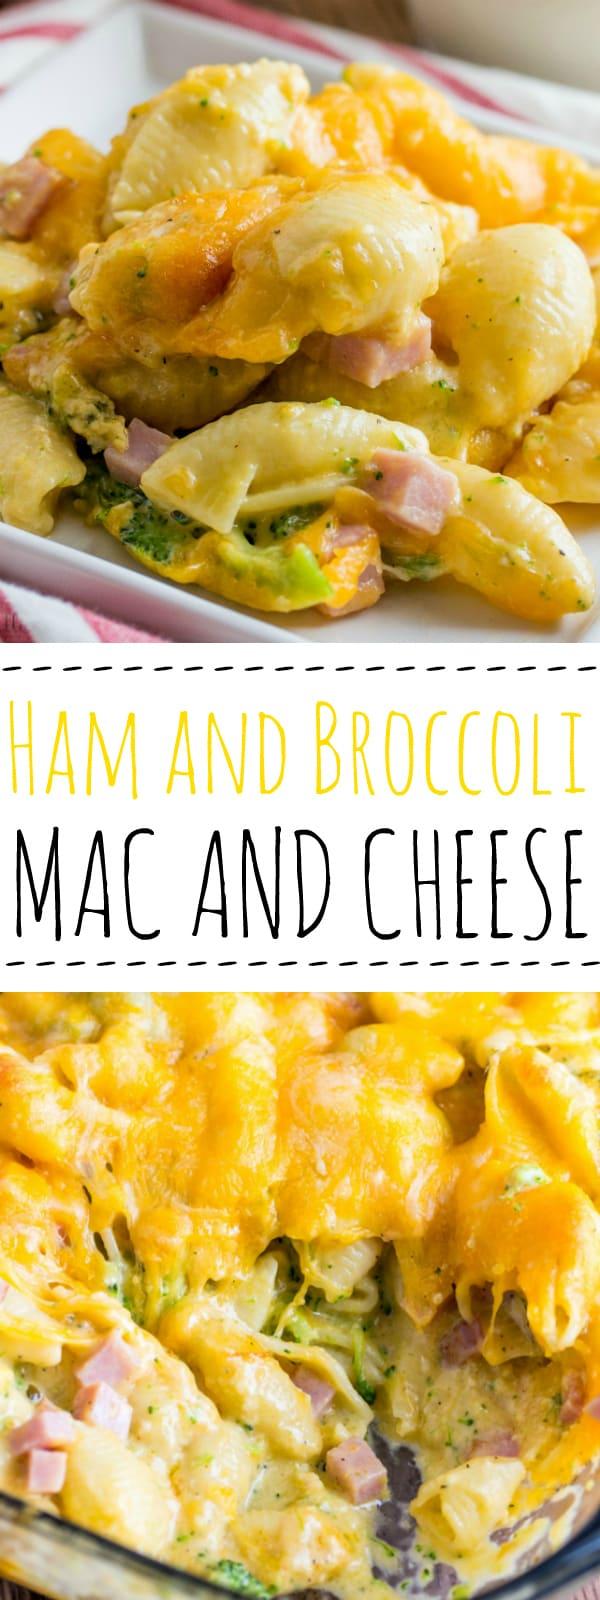 Ham and Broccoli Mac and Cheese